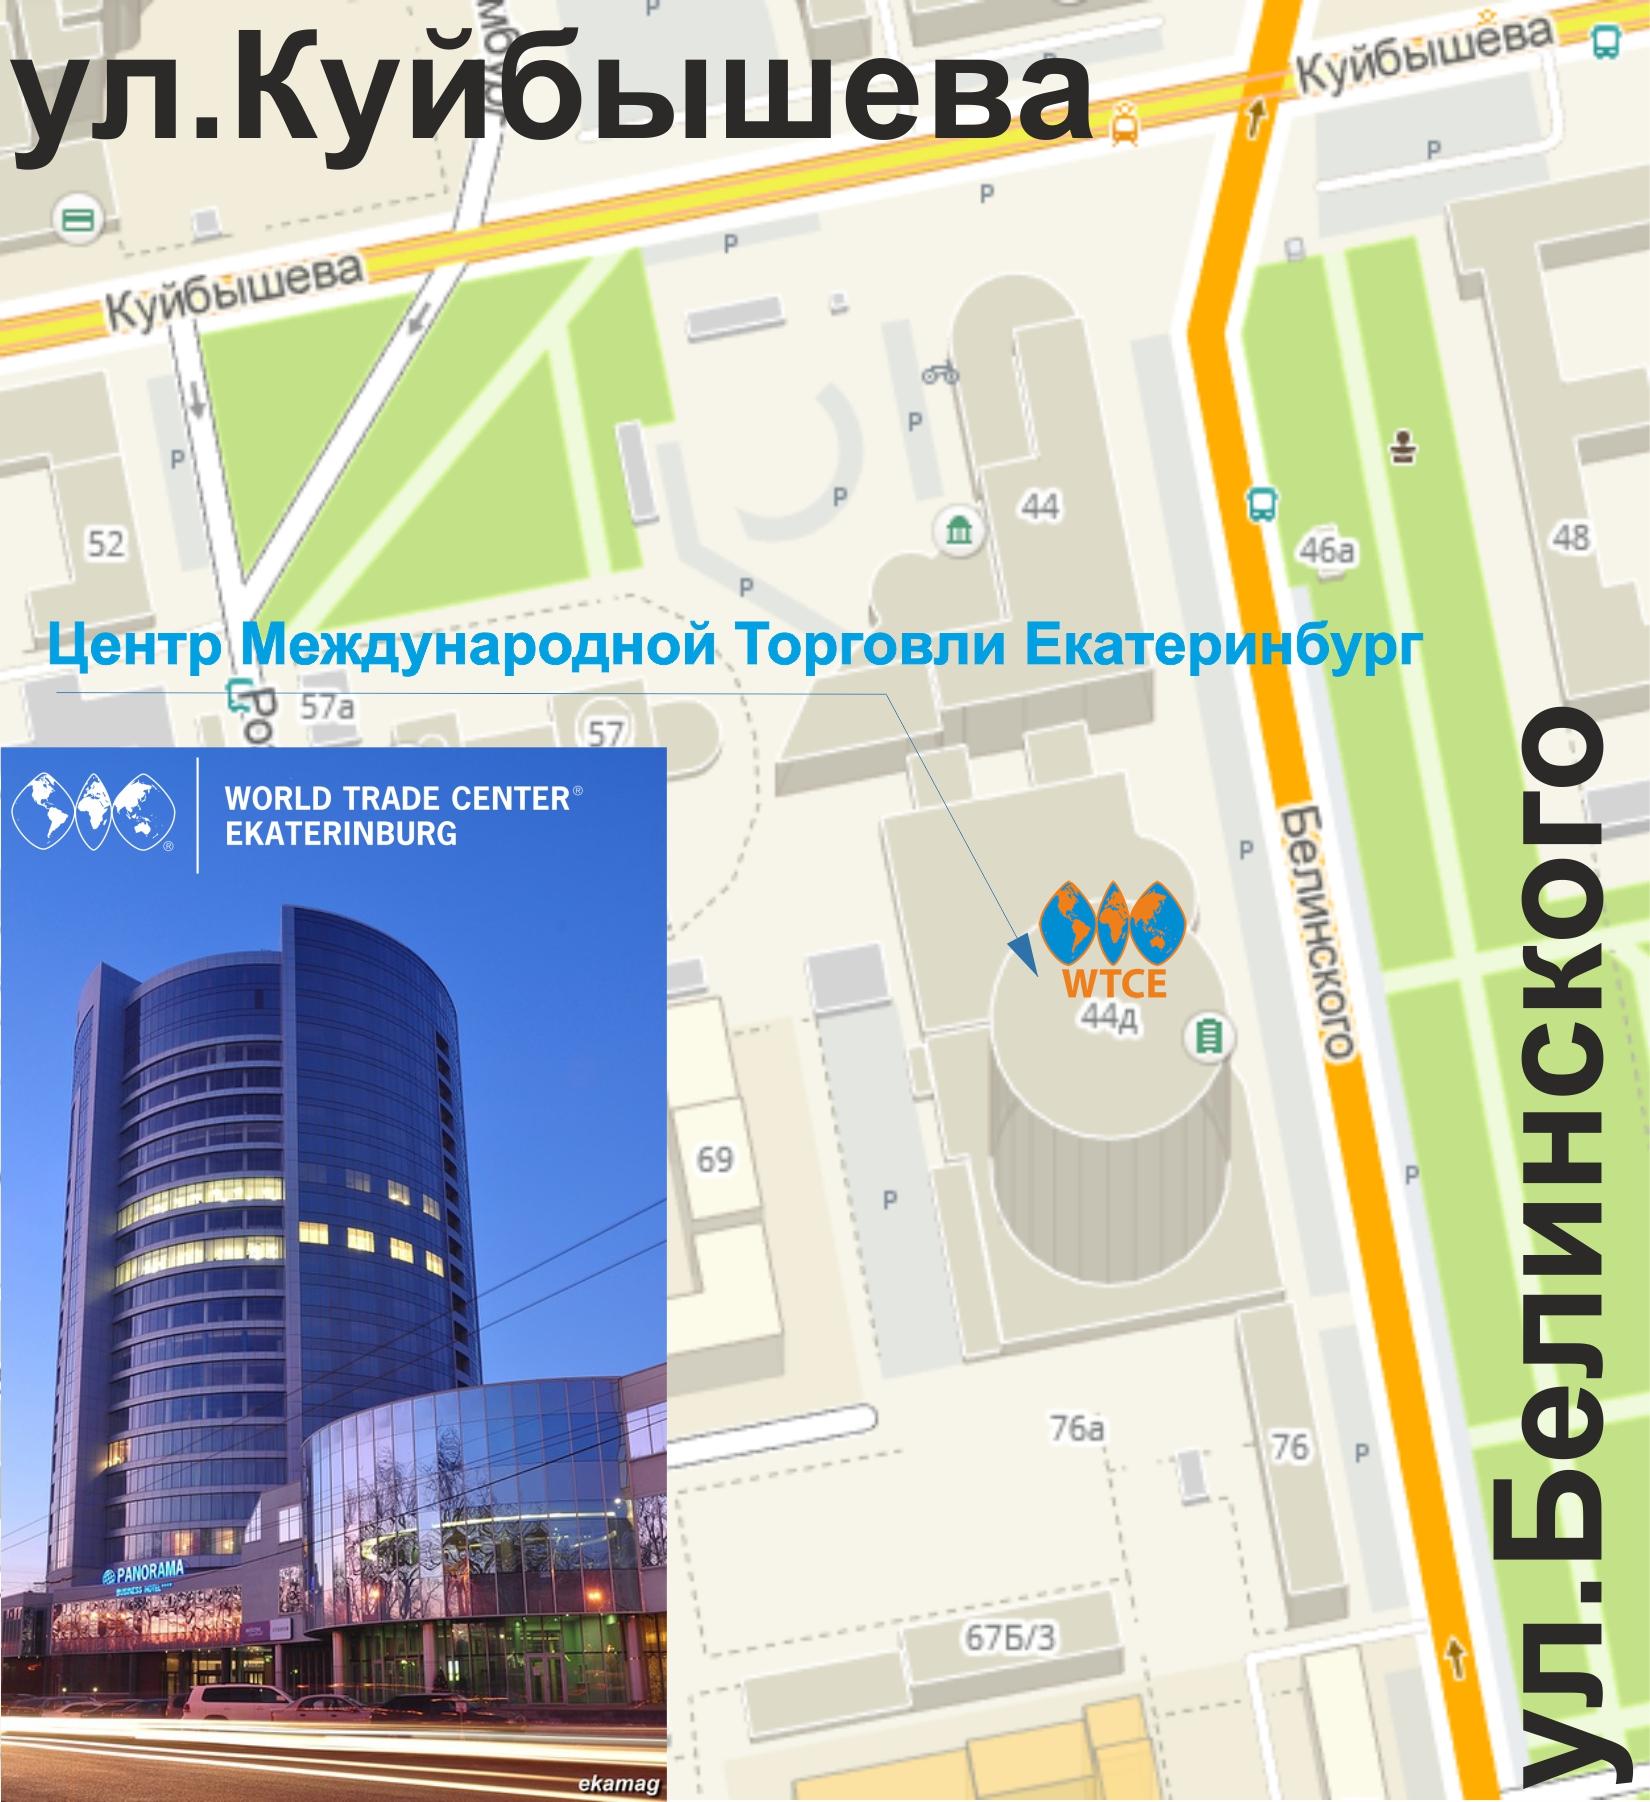 Схема центра международной торговли фото 213